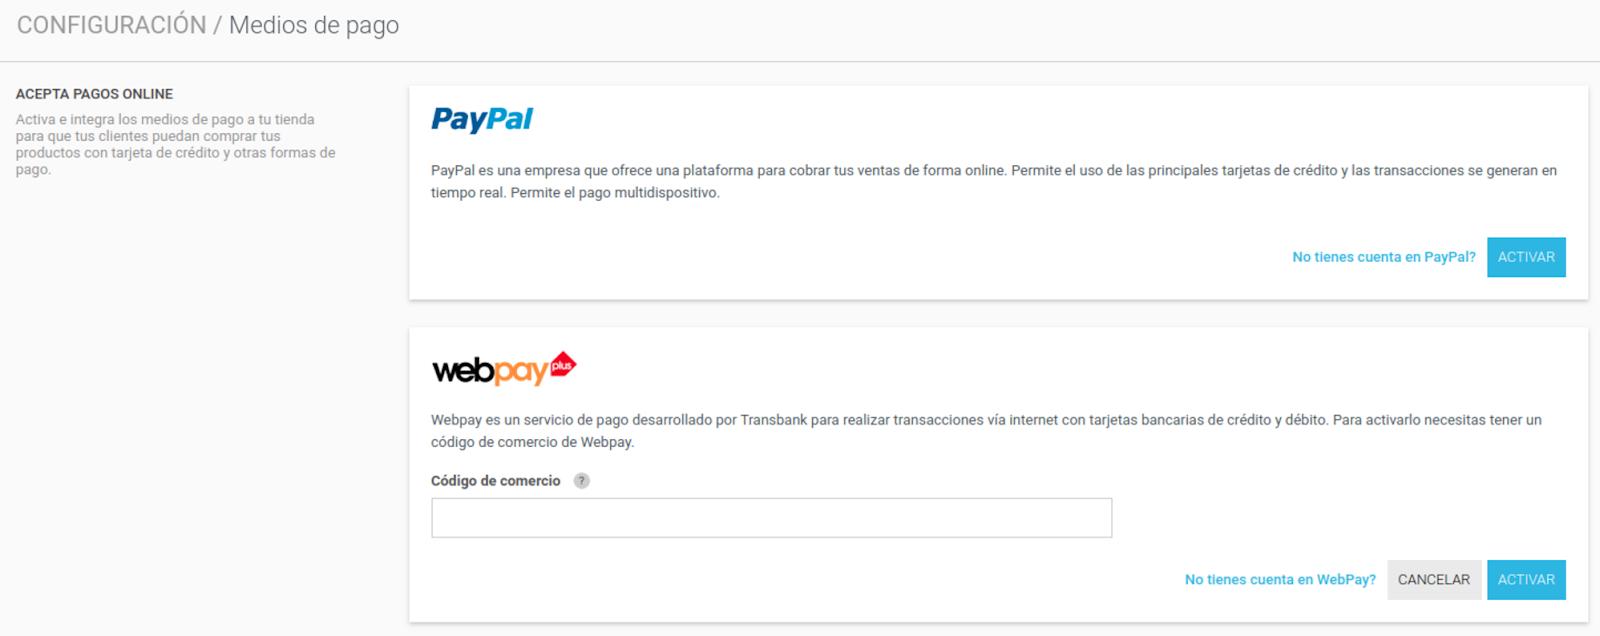 webpaycomercio